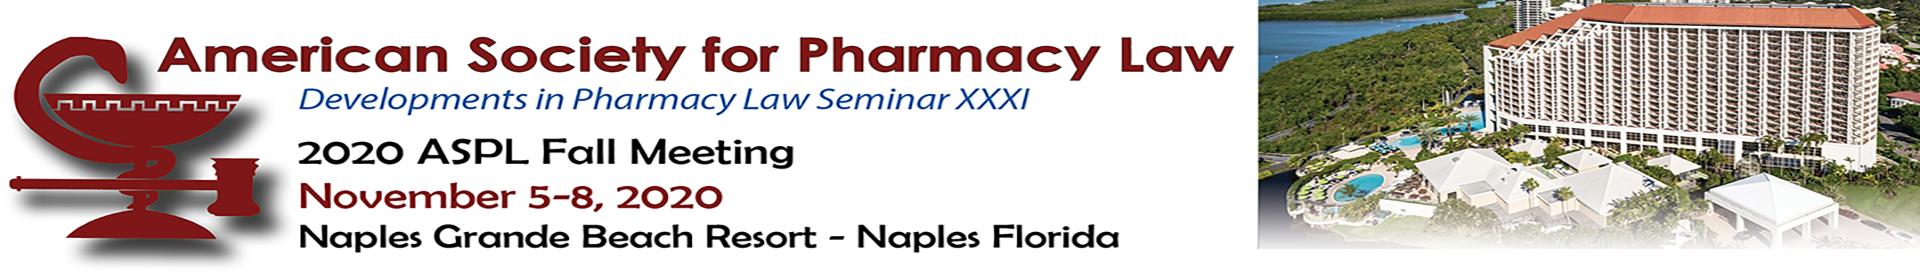 ASPL Developments in Pharmacy Law Seminar XXXI Event Banner